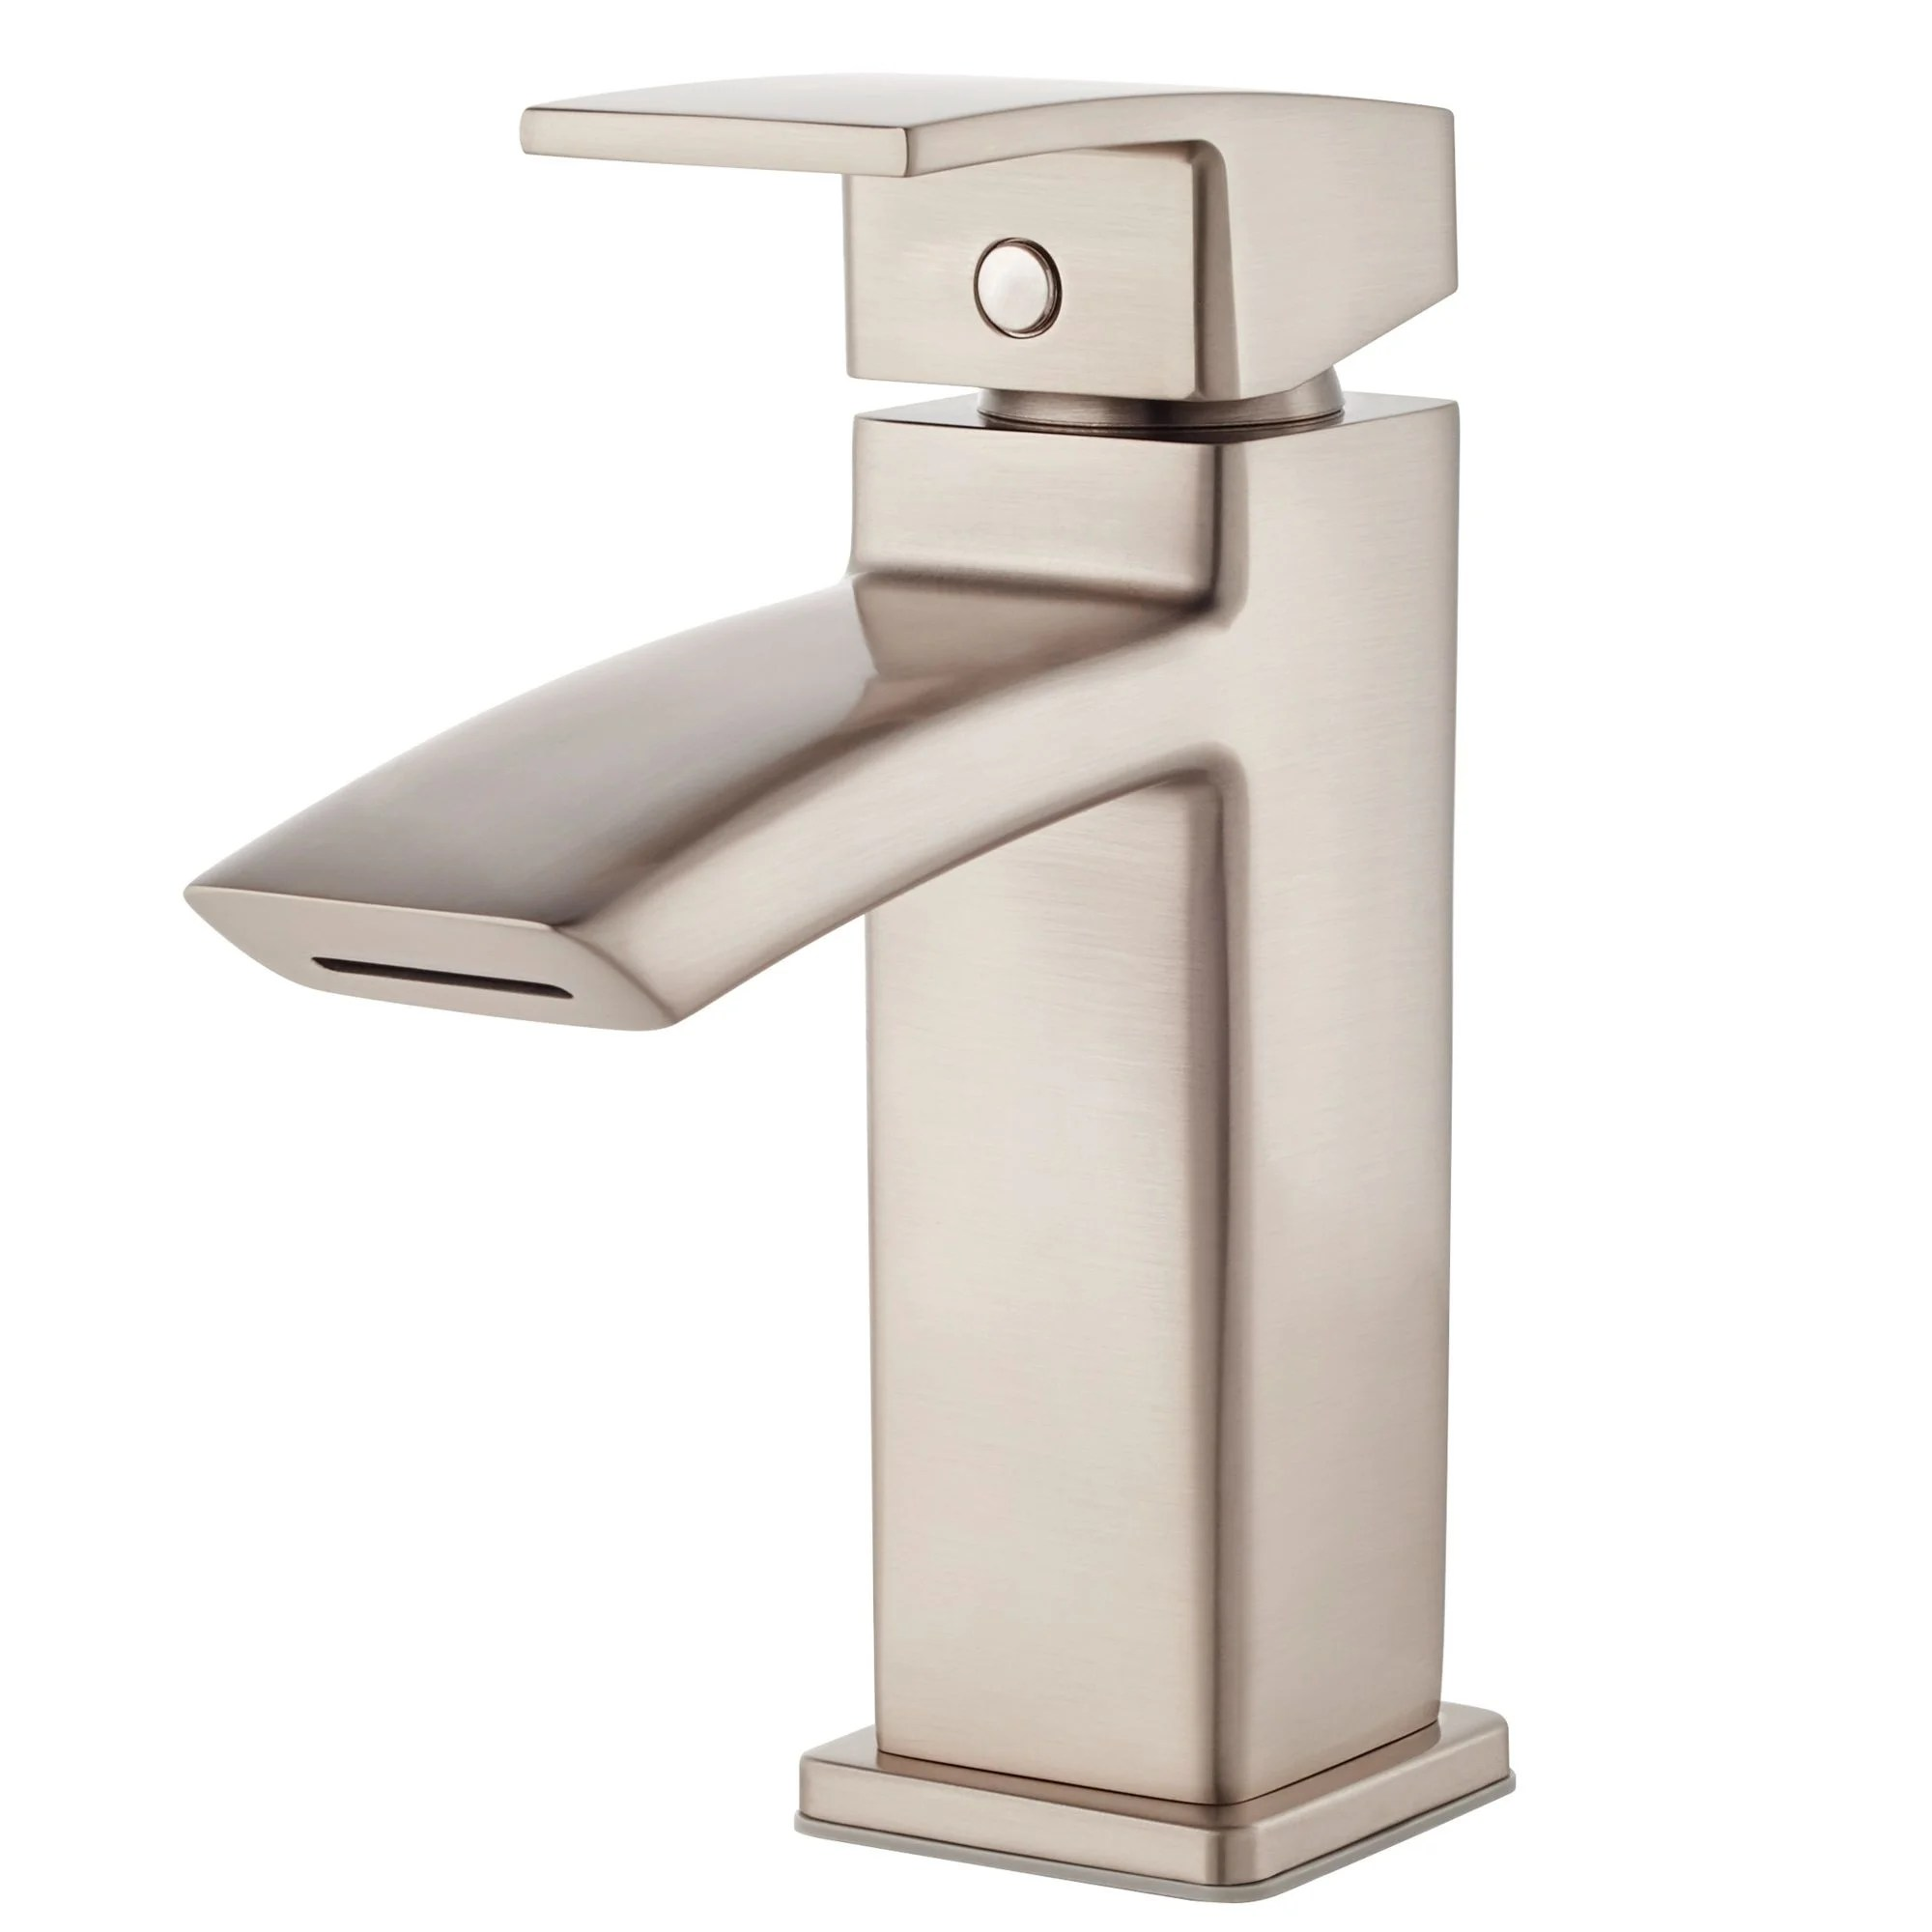 pfister lg42 df1 kenzo single hole bathroom faucet with metal pop up